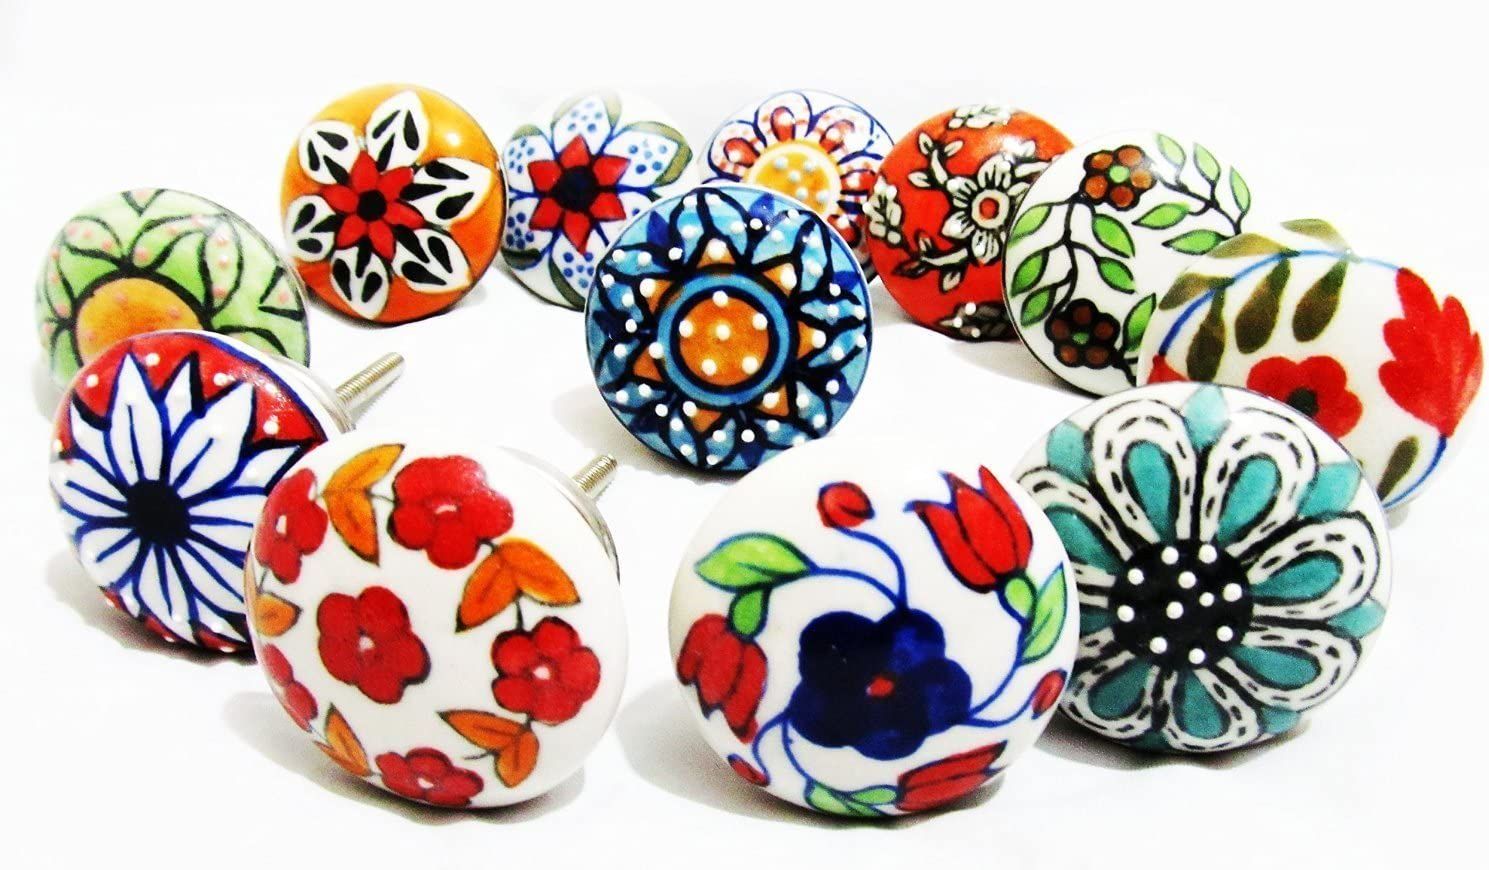 12 x Mix Vintage Look Flower Ceramic Knobs Door Handle Cabinet Drawer Cupboard Pull Cabinet Knobs by Zoya's